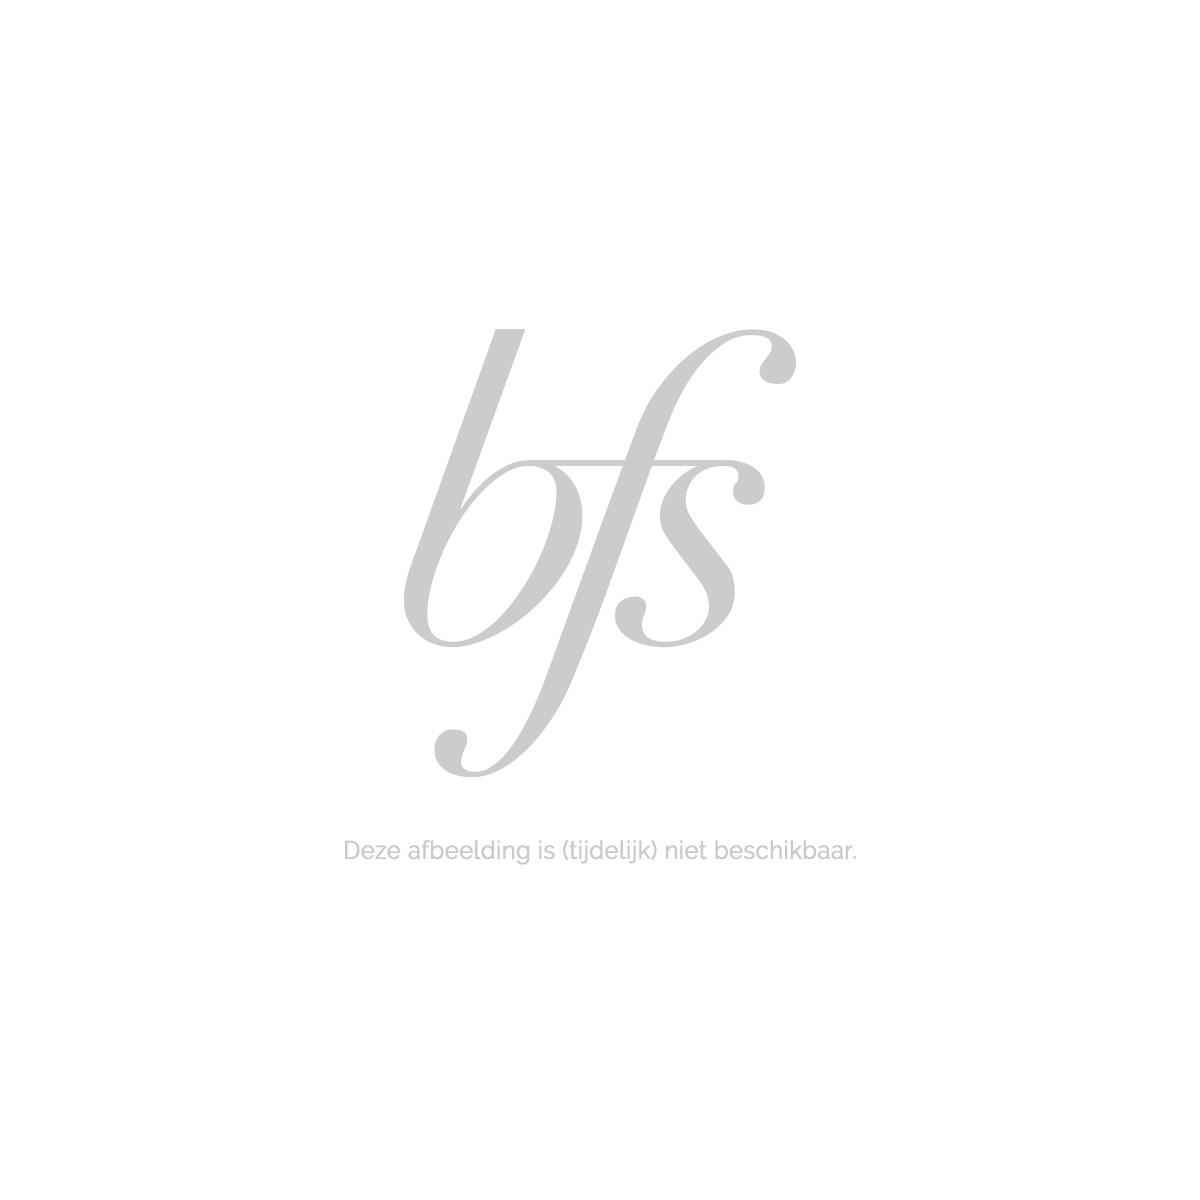 Christian Dior Dissolvant Abricot Gentle Polish Remover 50 Ml